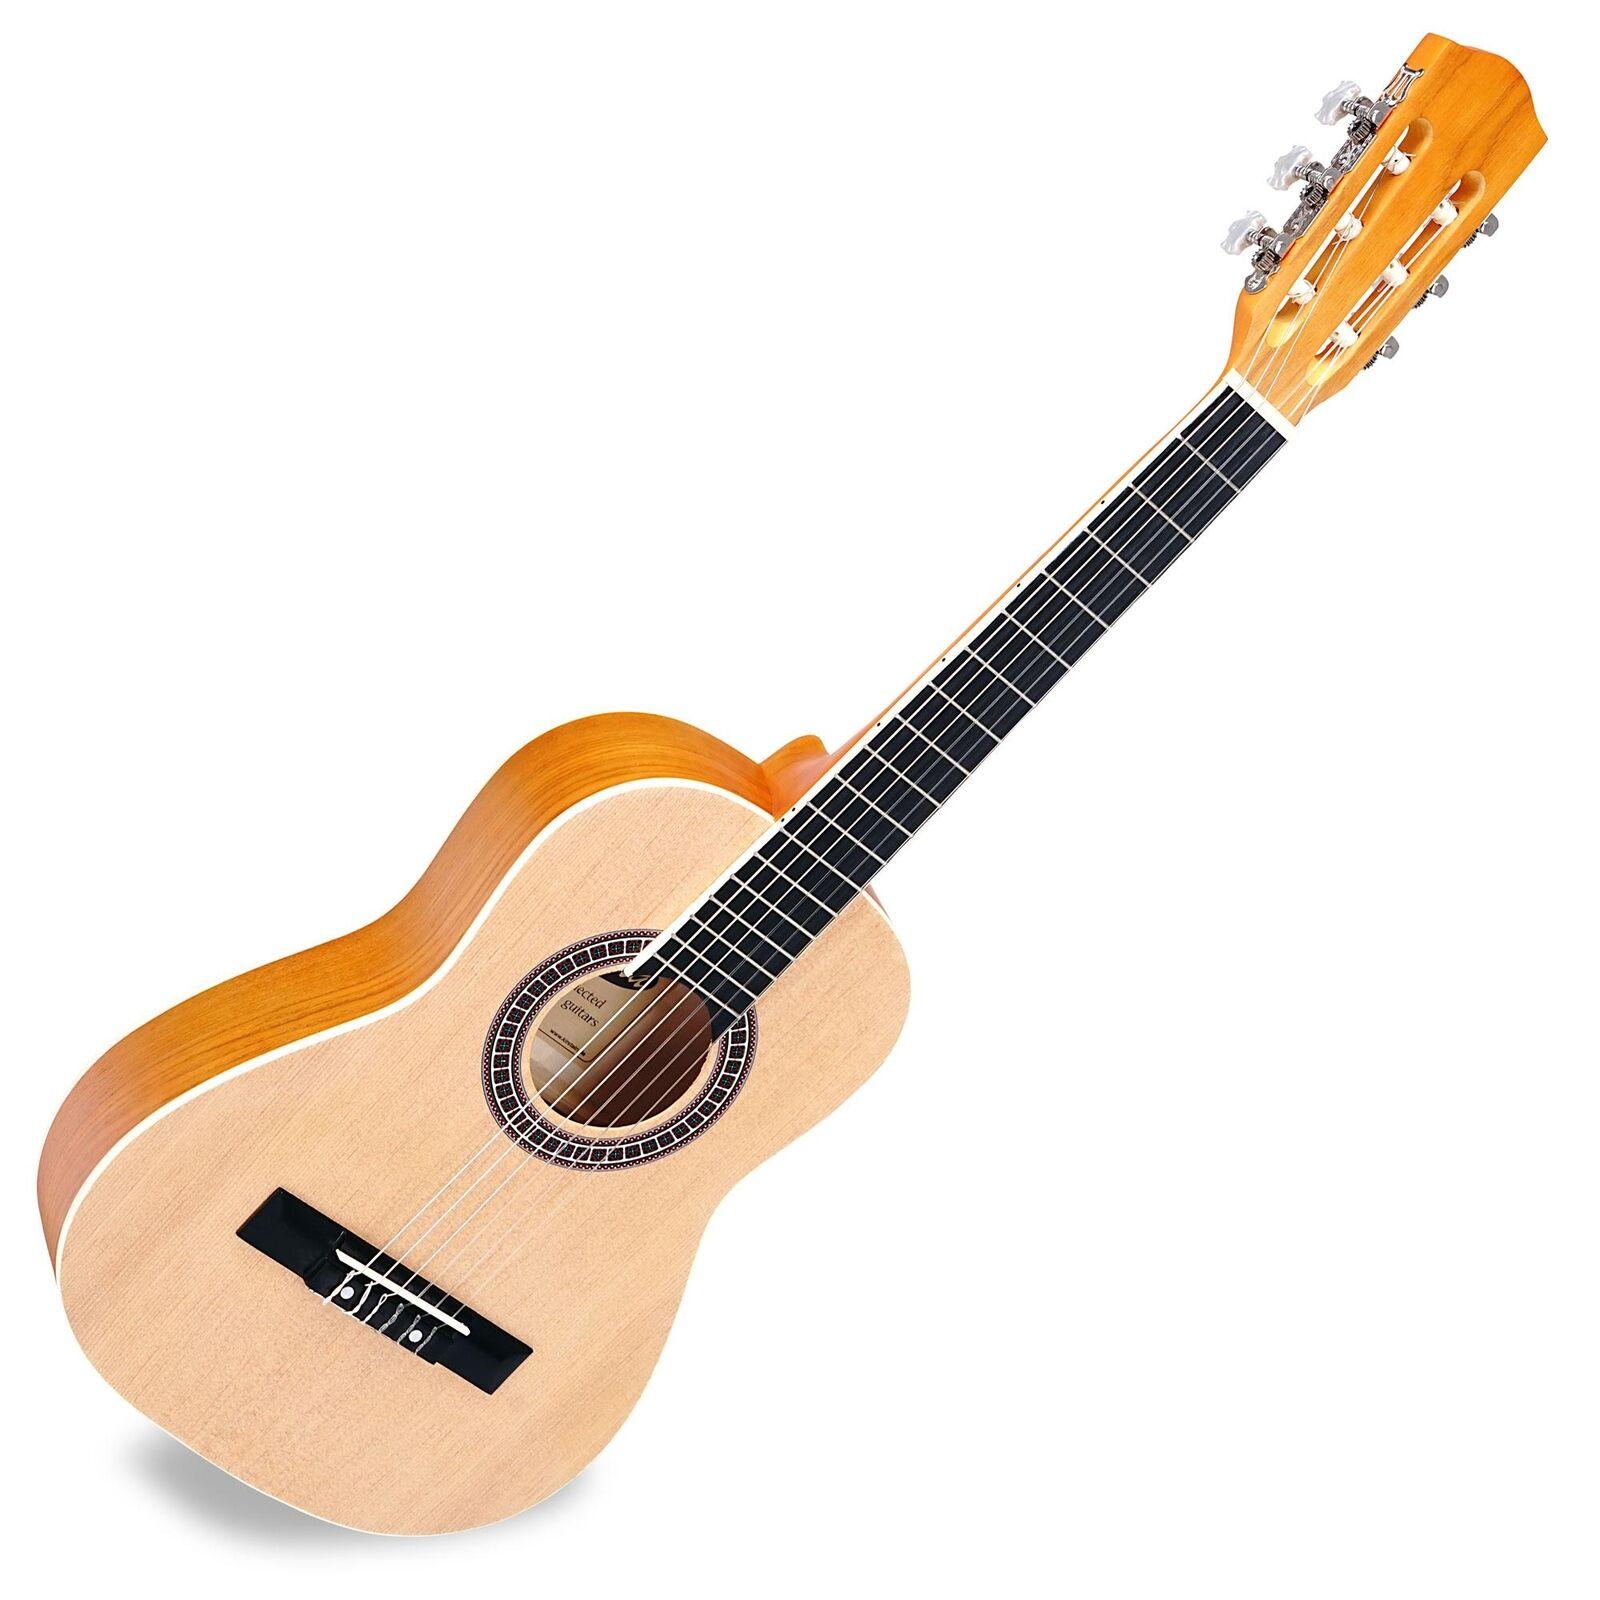 Classic Guitar Acoustic Concert Beginner Guitars 6 Nylon Strings Größe 1 2 Ecru